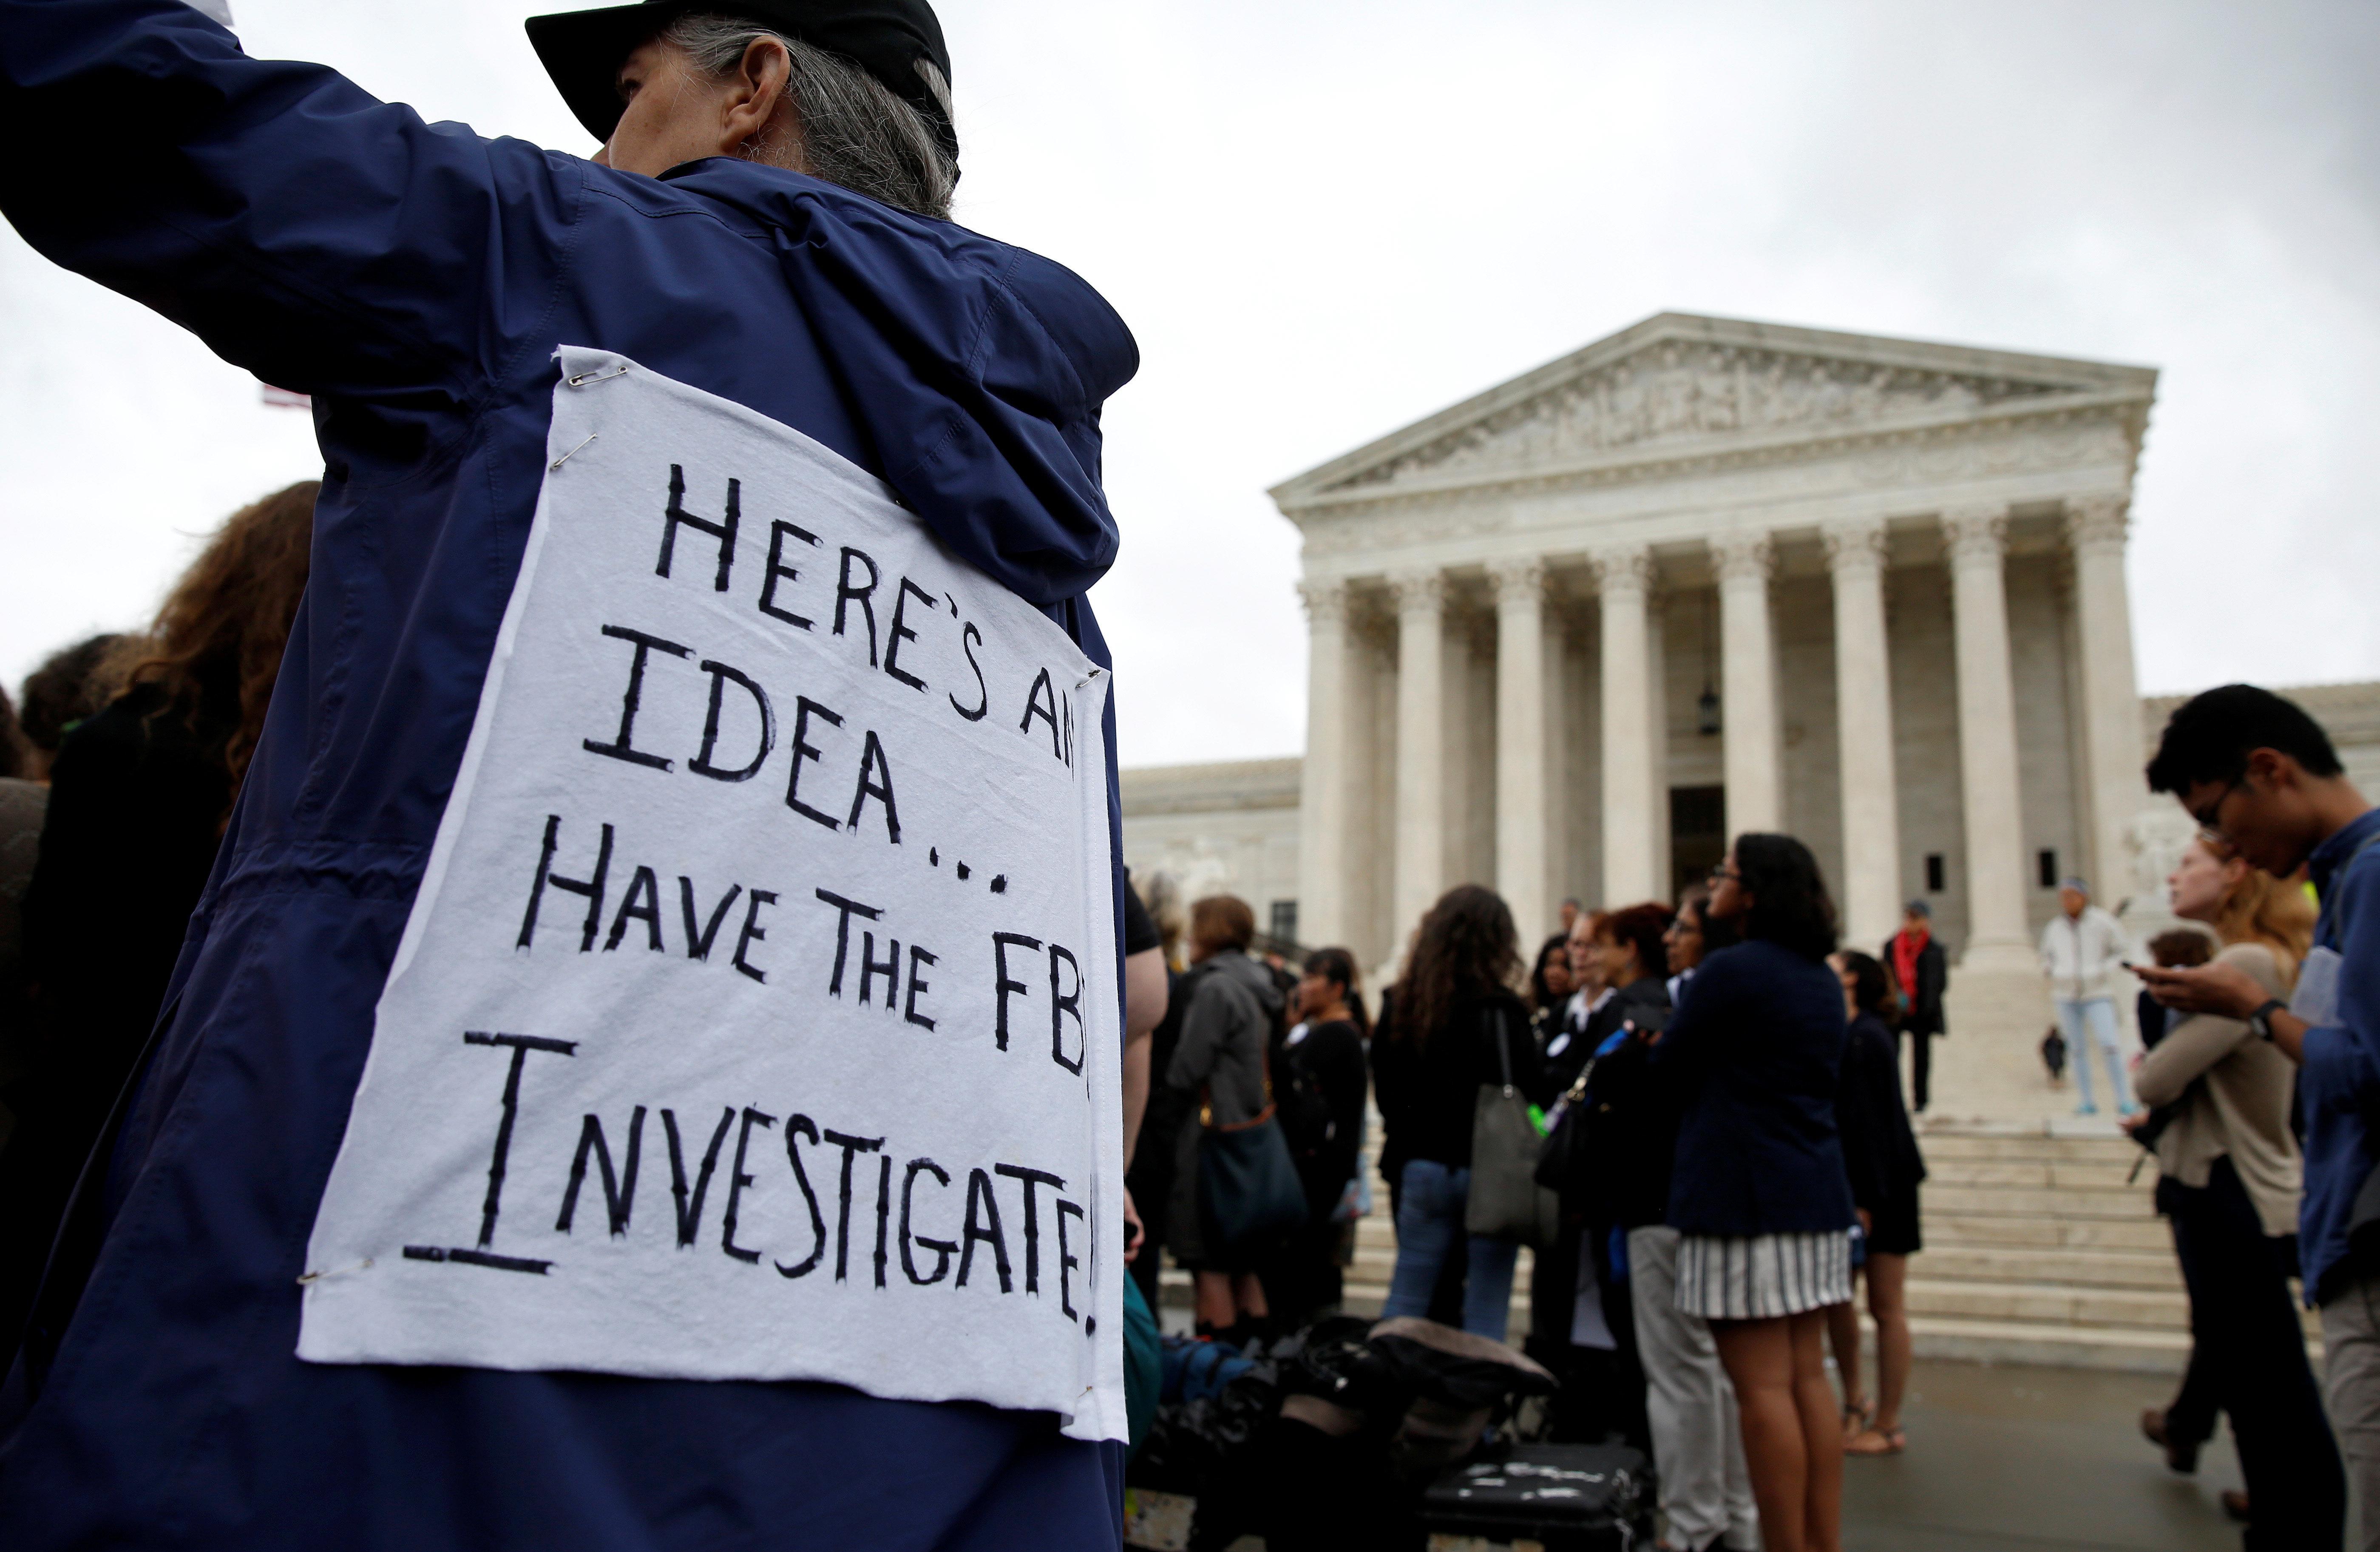 Demonstrators protest against U.S. Supreme Court nominee Brett Kavanaugh in front of the Supreme Court in Washington, U.S., September 24, 2018.      REUTERS/Joshua Roberts